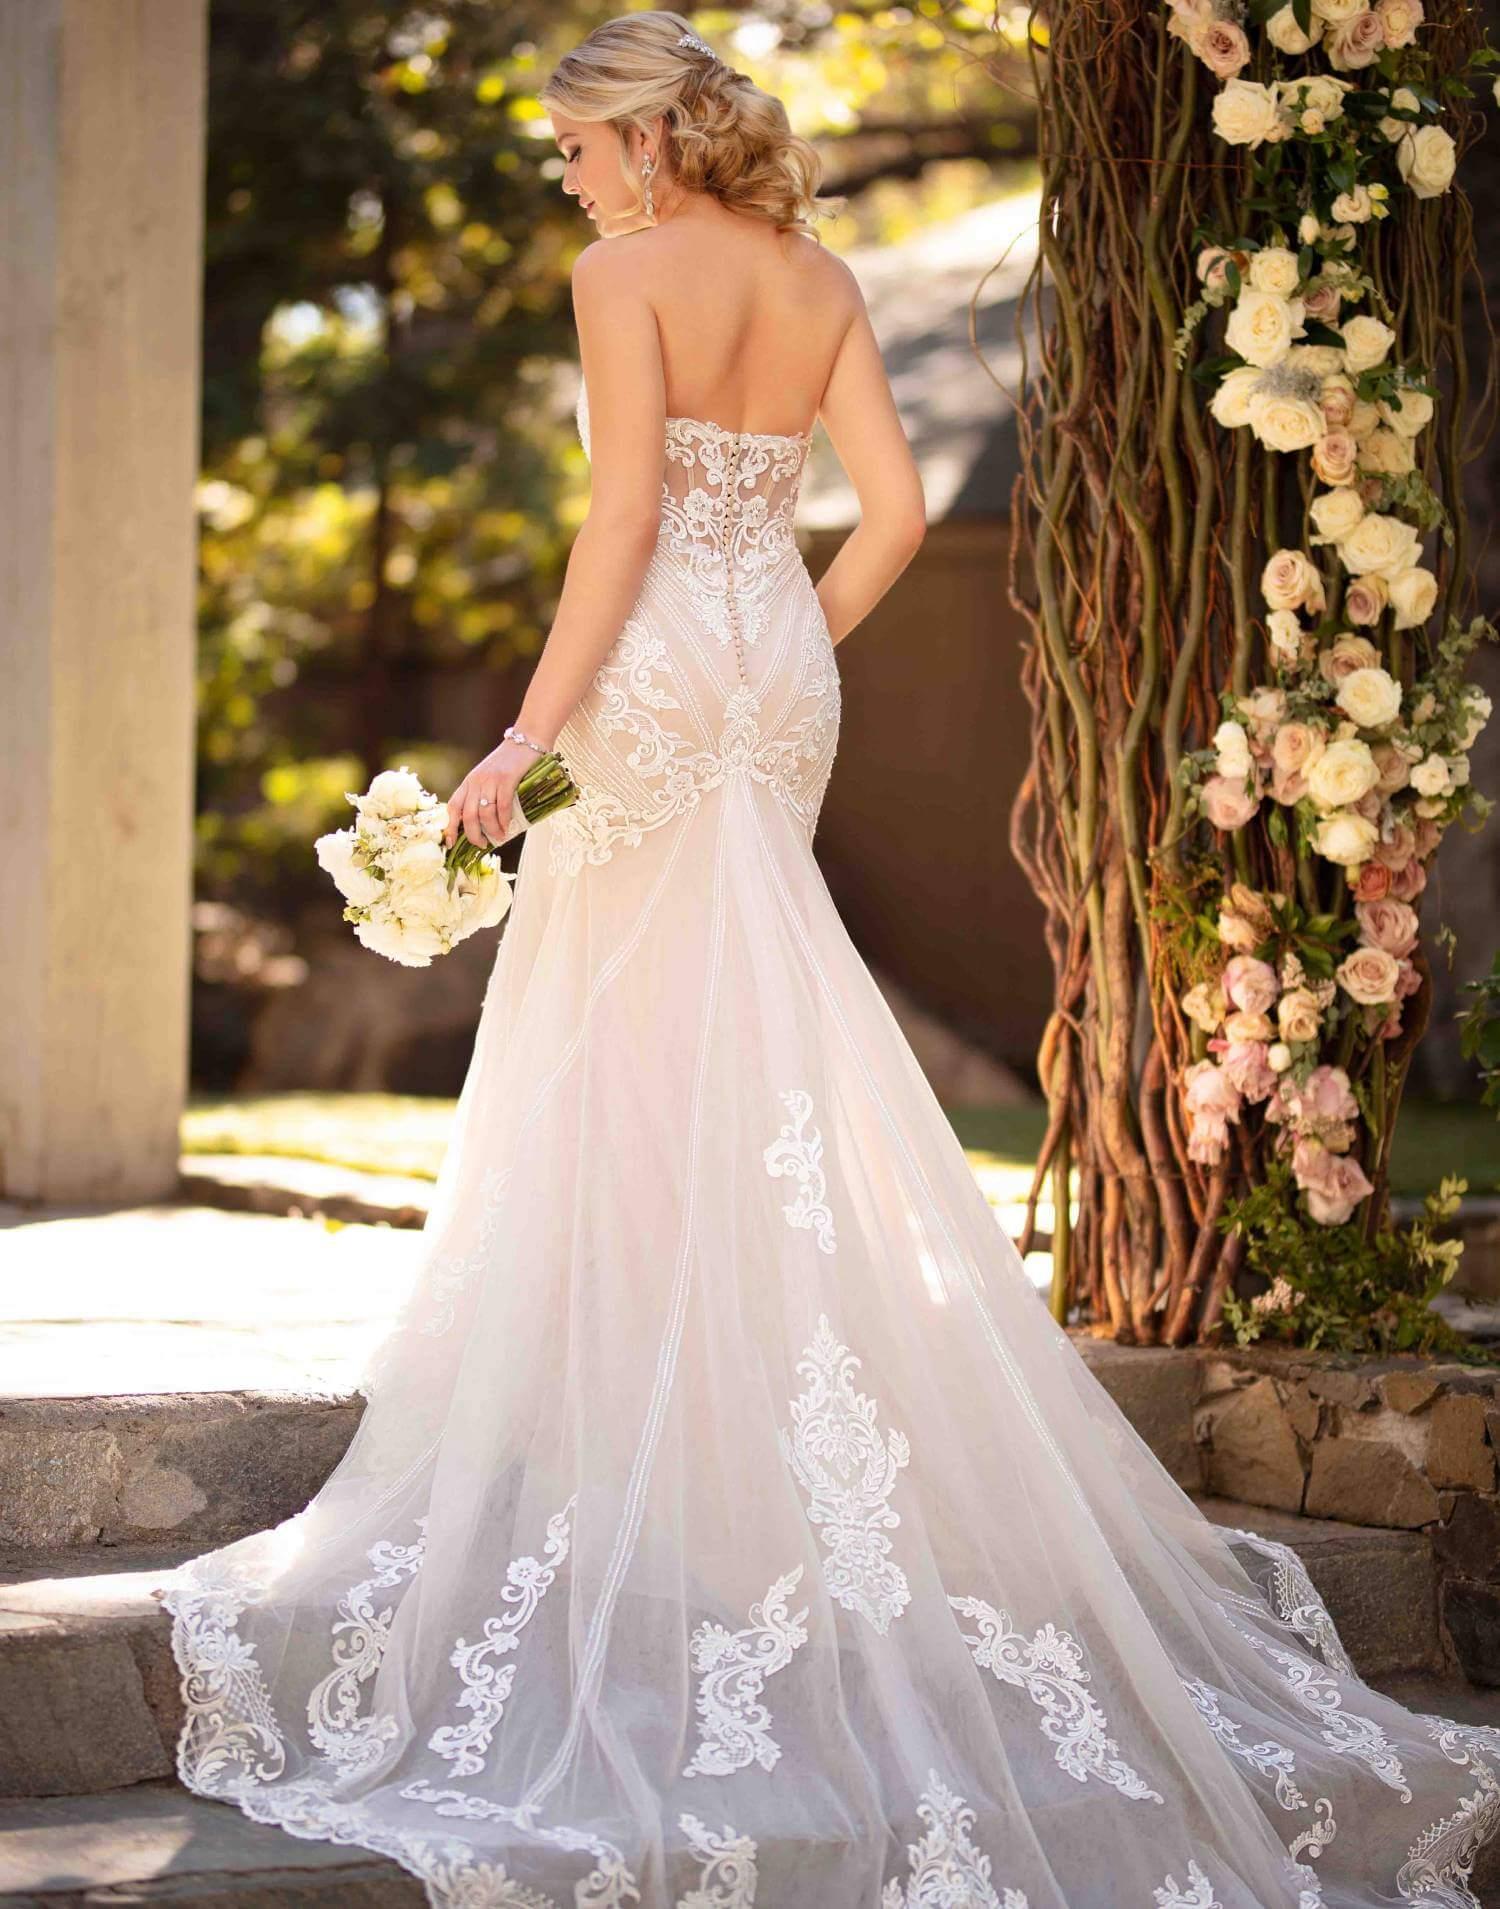 D2819 – Essense of Australia Wedding Dress Collection – Front View